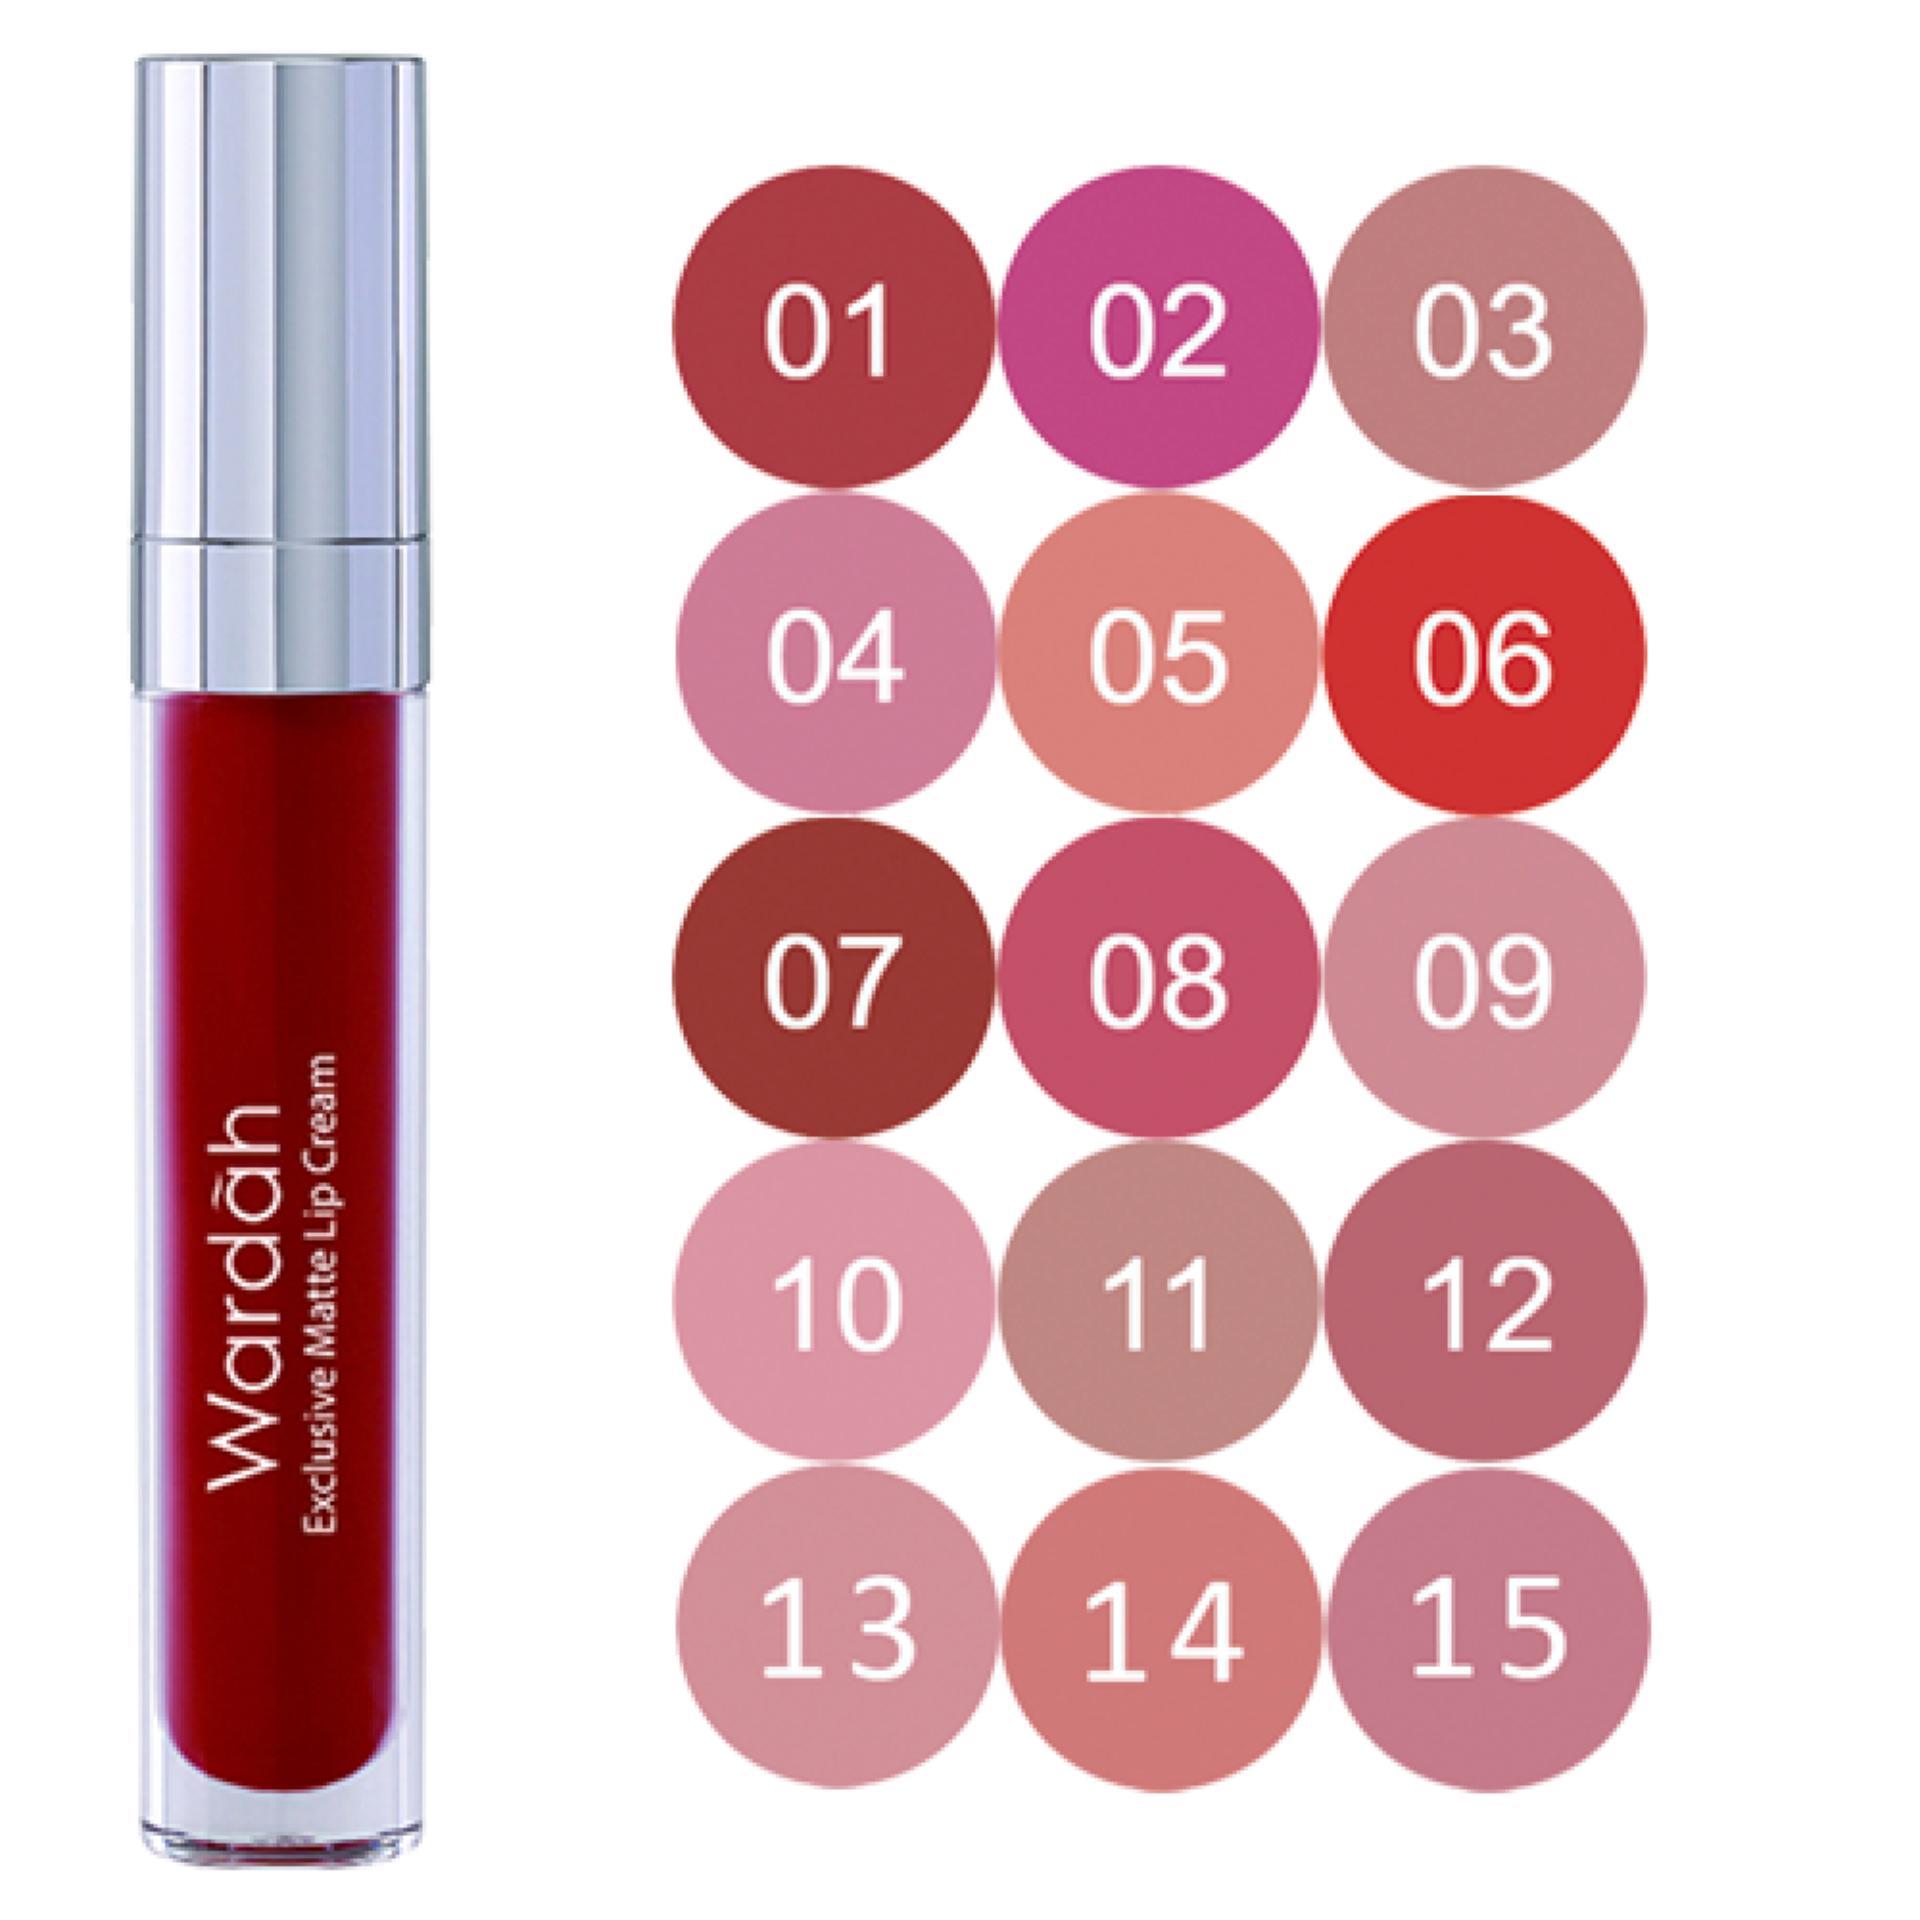 Promo Spesial Wardah Exclusive Lip Matte Cream No 06 Feeling Red Di Lt Pro Longlasting 07 Original